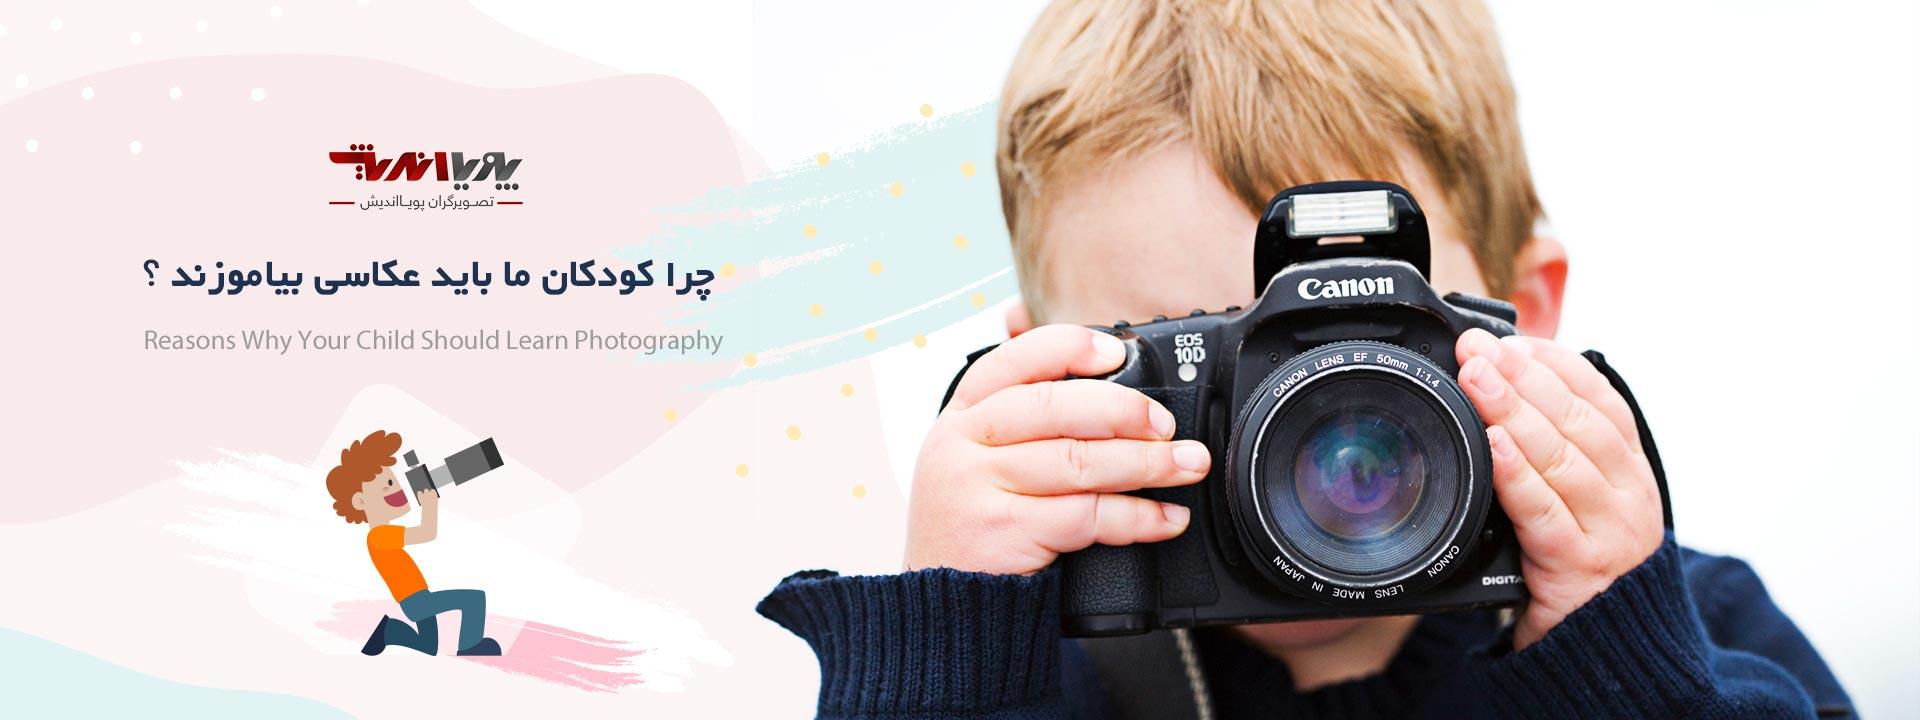 the boy photographing banner - چرا کودکان ما باید عکاسی بیاموزند ؟